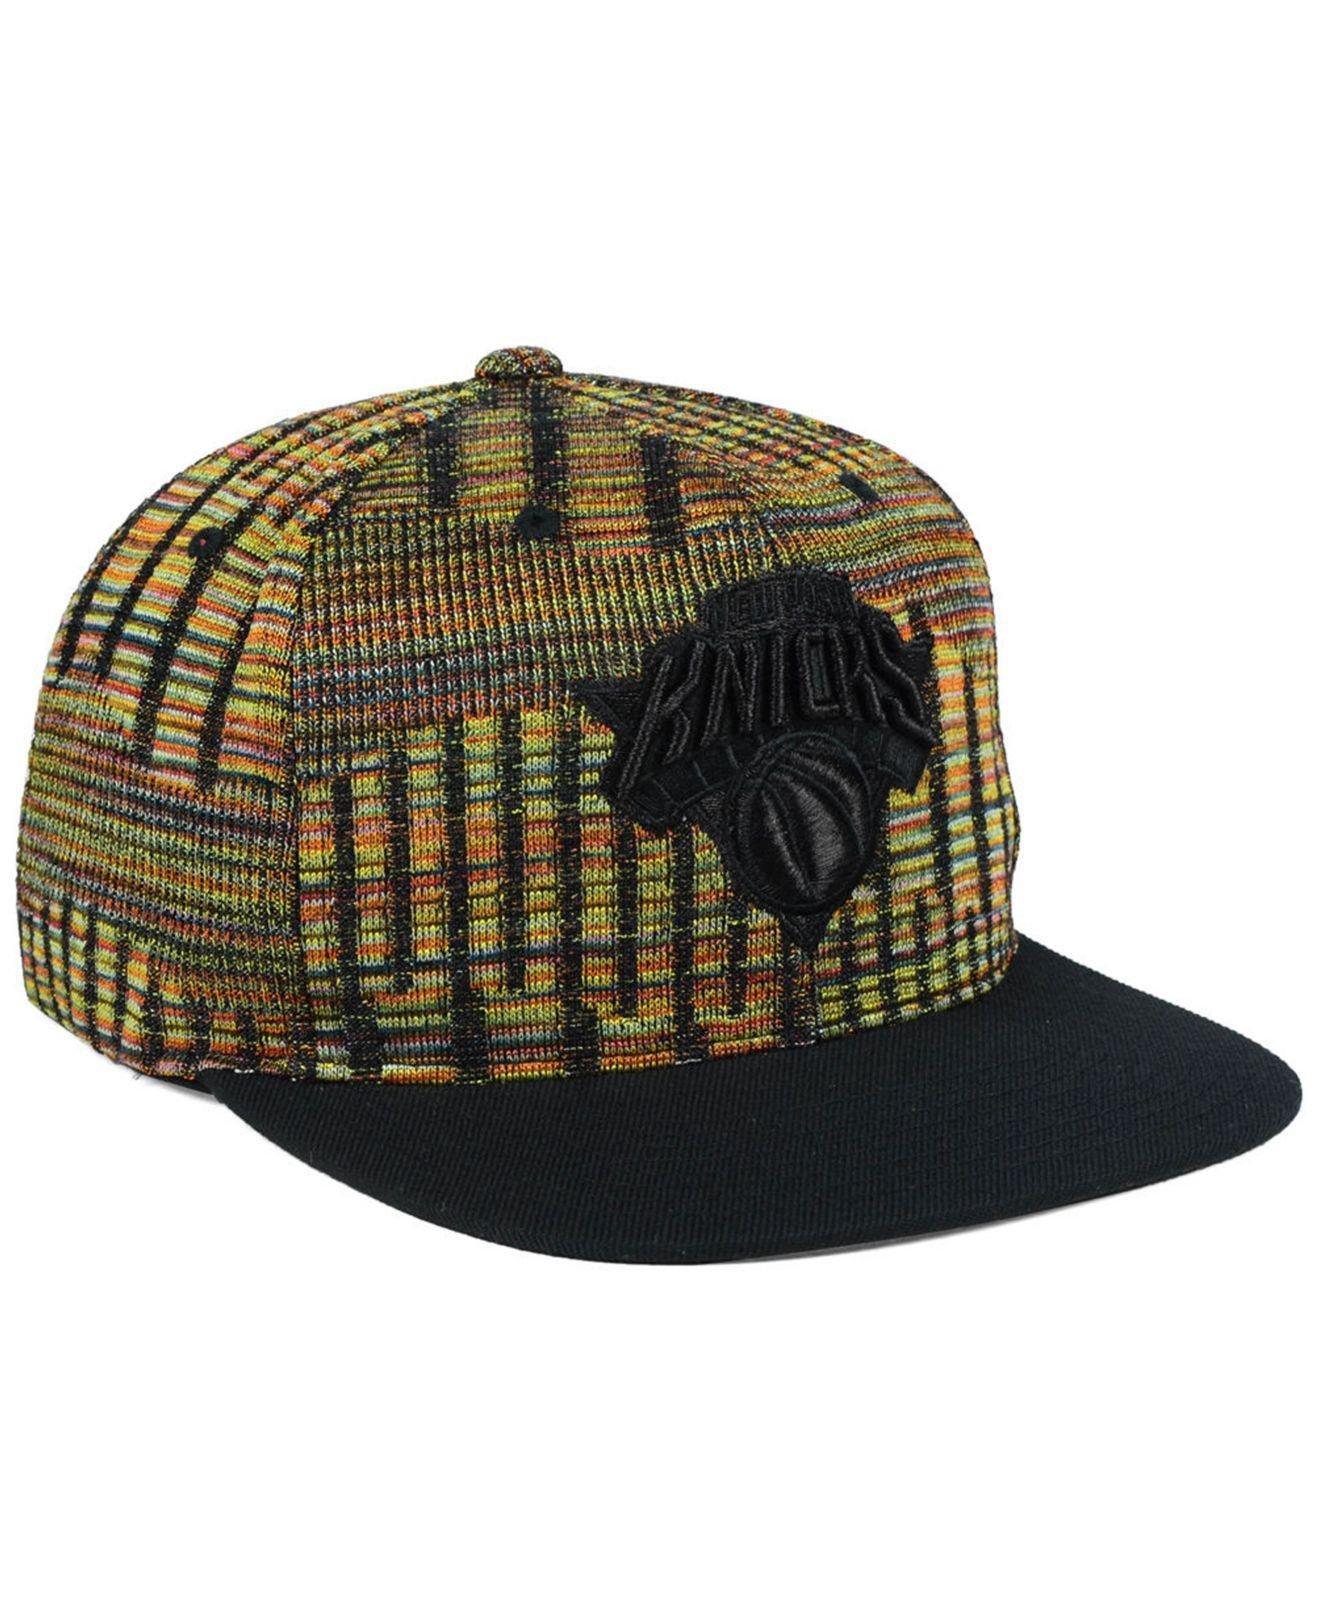 cheap for discount c9844 48878 ... cropped xl logo adjustable snapback hat royal orange 614b5 fba7f   canada lyst mitchell ness new york knicks black flag snapback cap in 84740  baa27